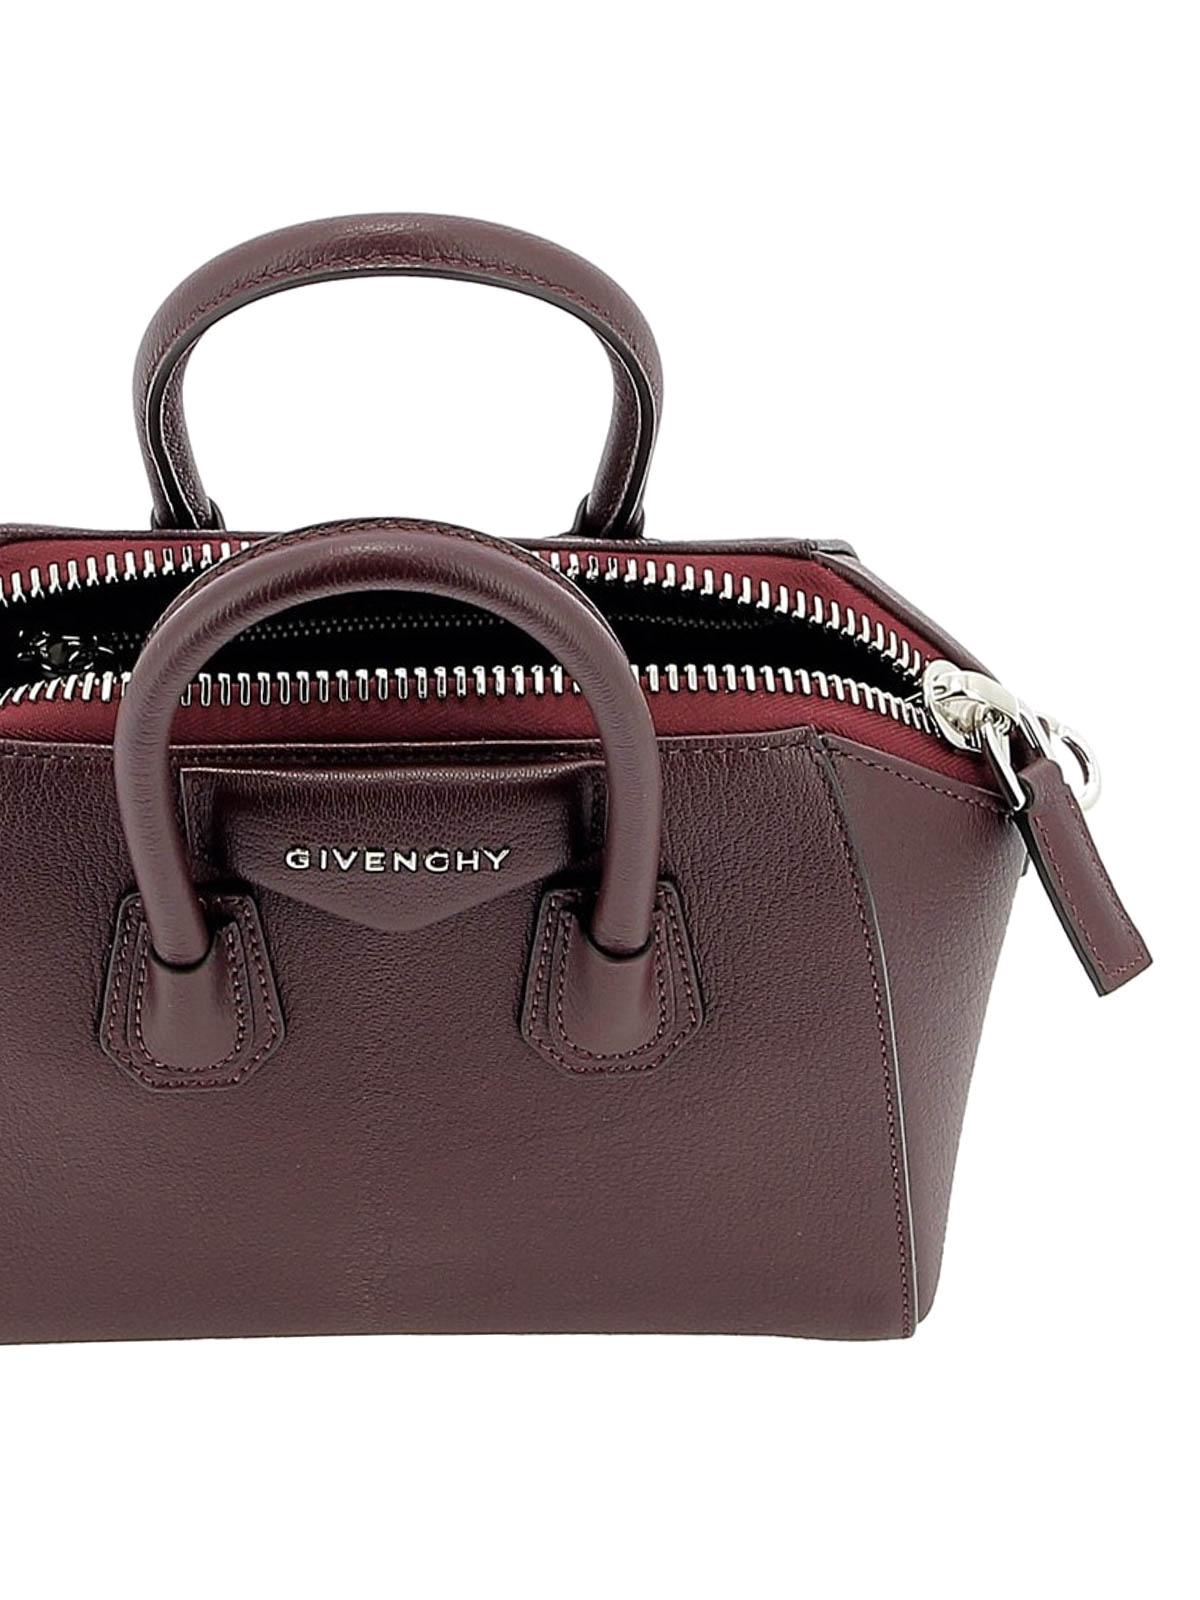 43f3eda2649 GIVENCHY buy online Antigona aubergine leather mini handbag. GIVENCHY: bowling  bags ...